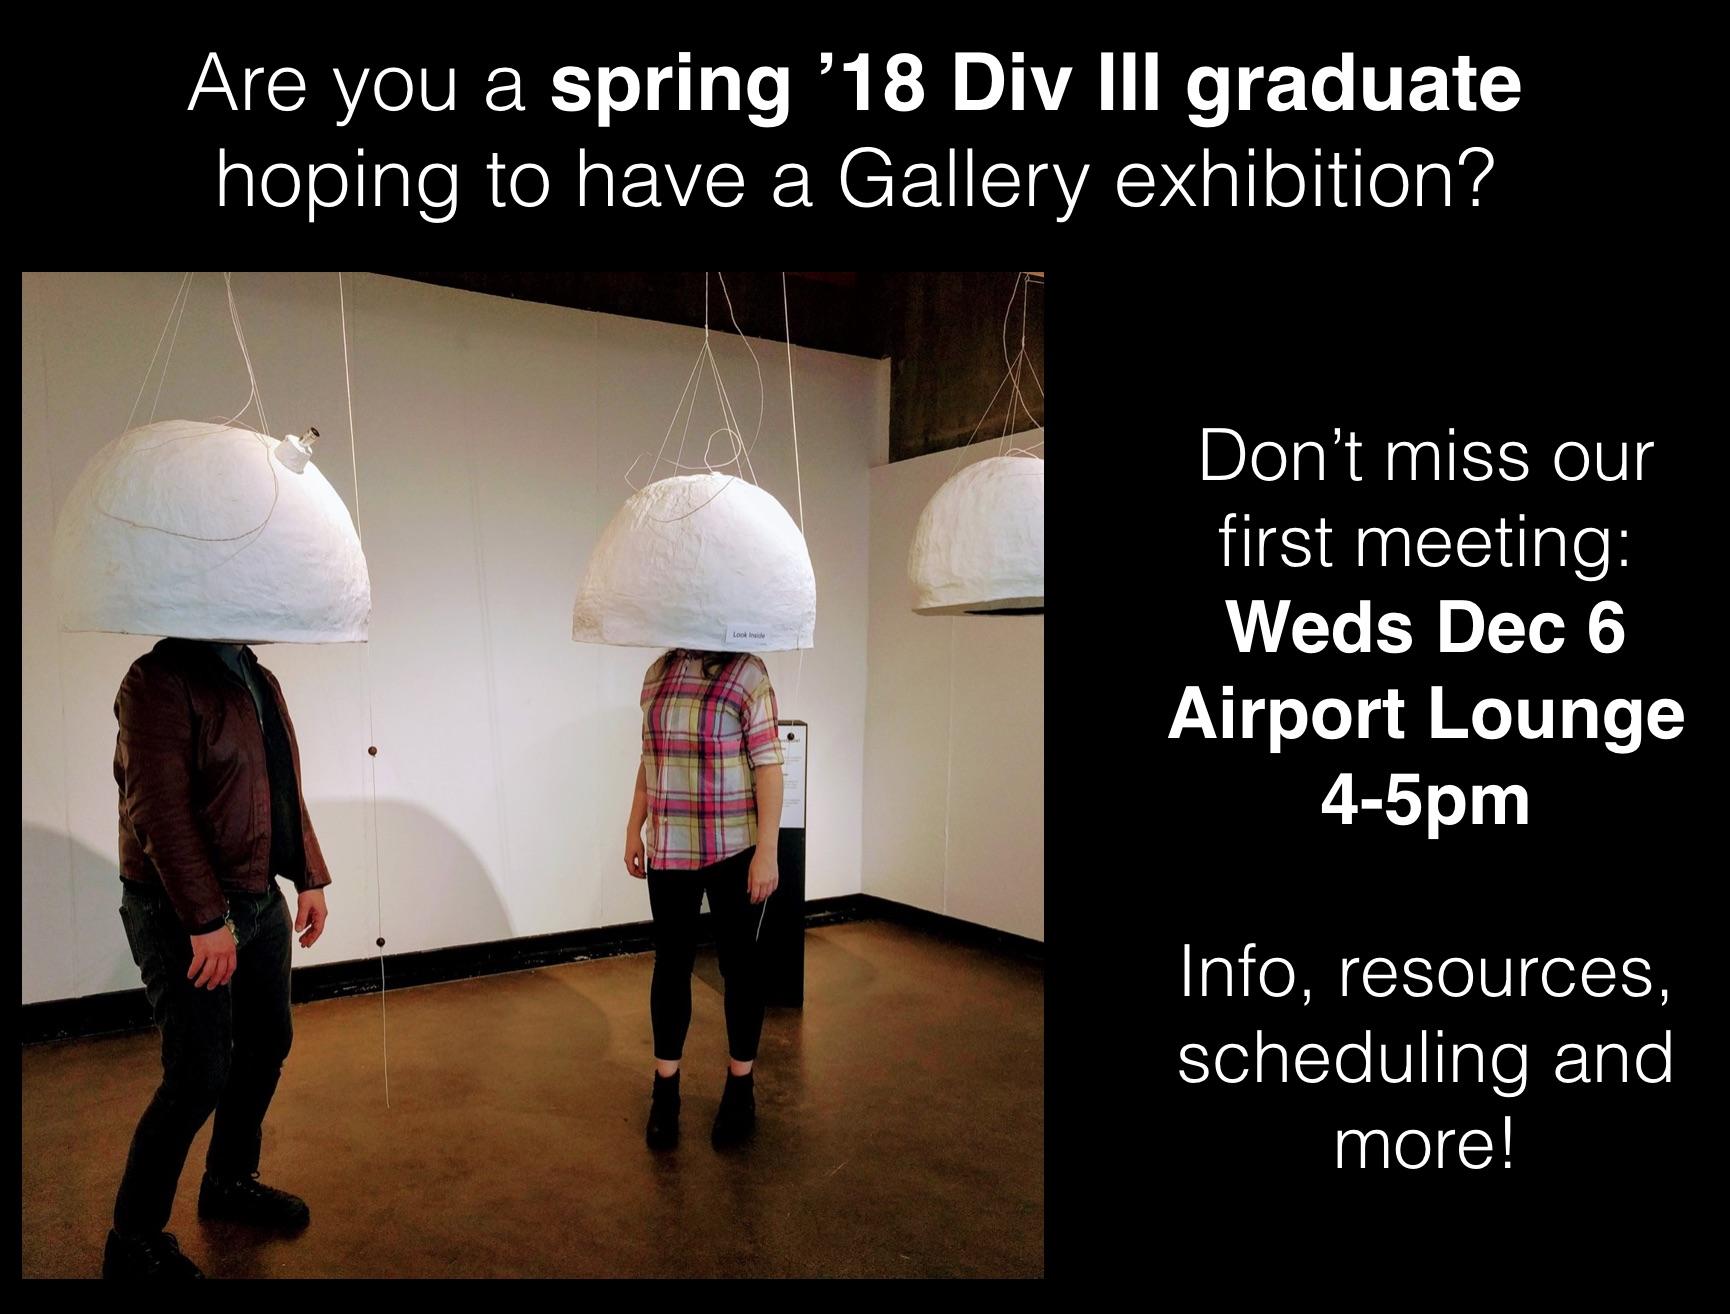 Spring '18 Div III Graduates